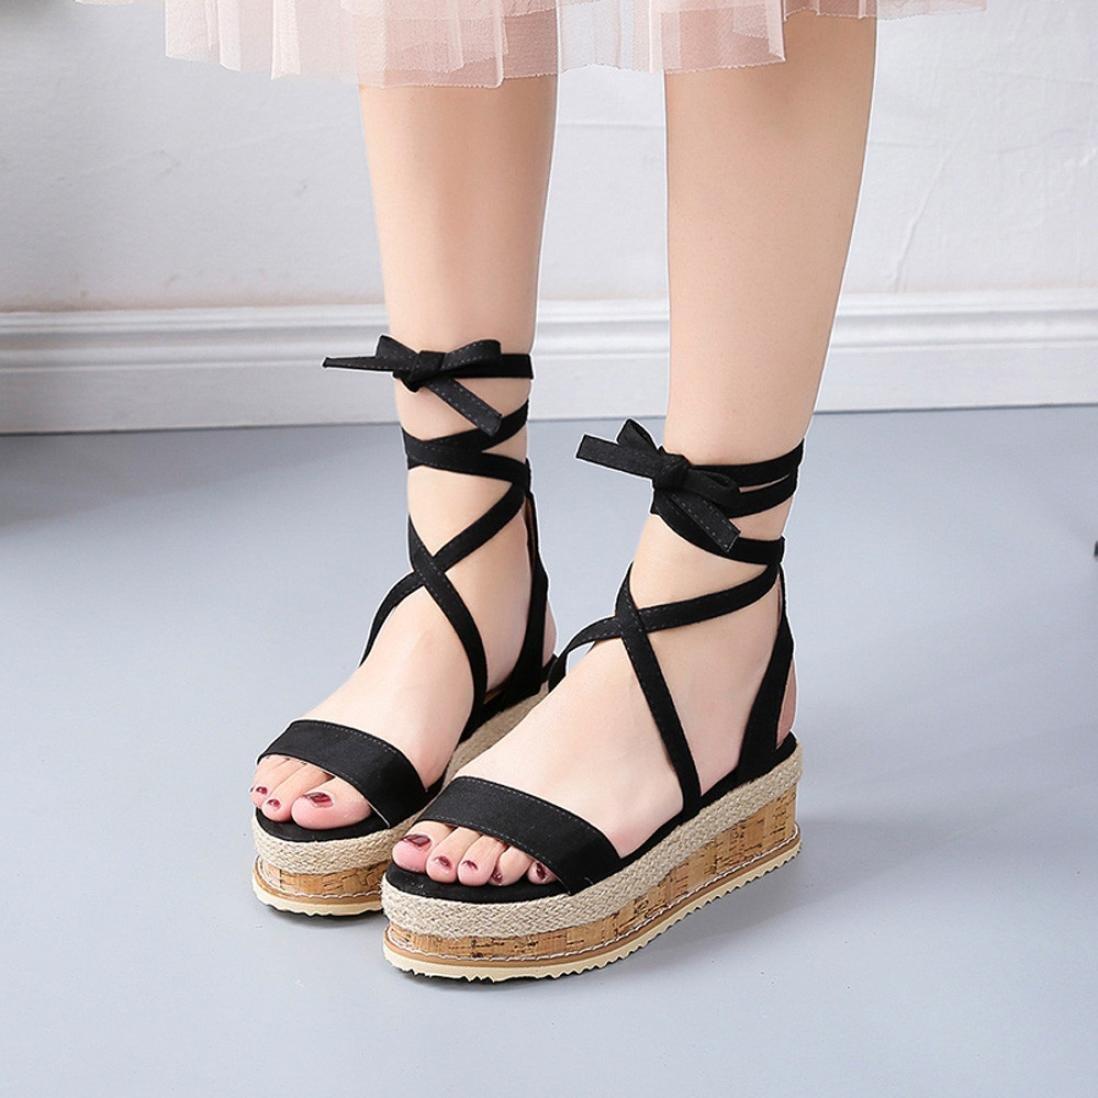 665b7ebc462e Amazon.com  Baigoods Ladies Women Roman Shoes Platform Woven Thick-Bottom  Waterproof Wedge Cross-tied Sandals  Sports   Outdoors